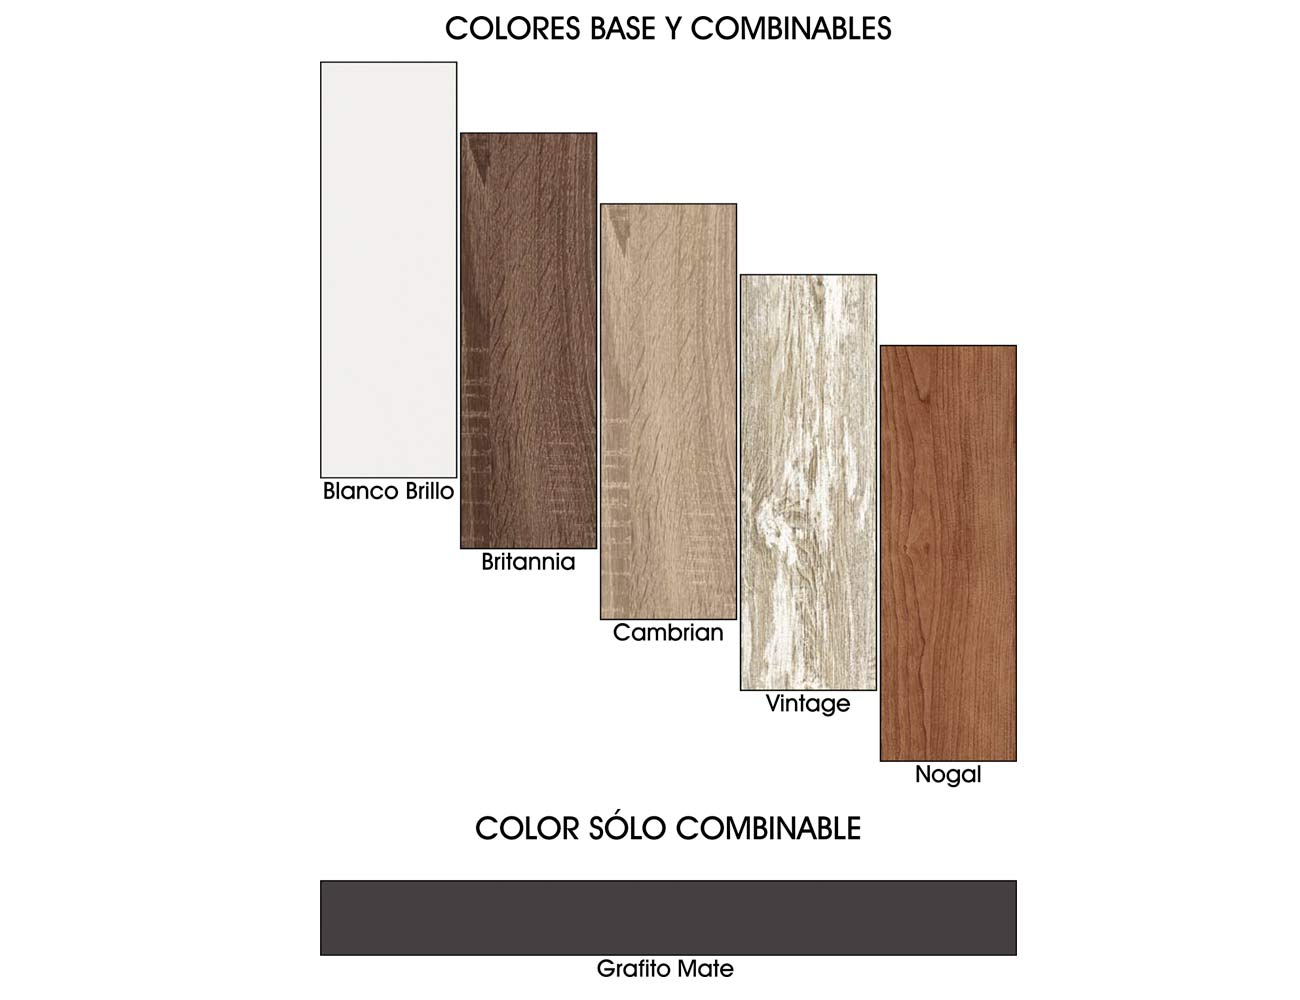 Colores24